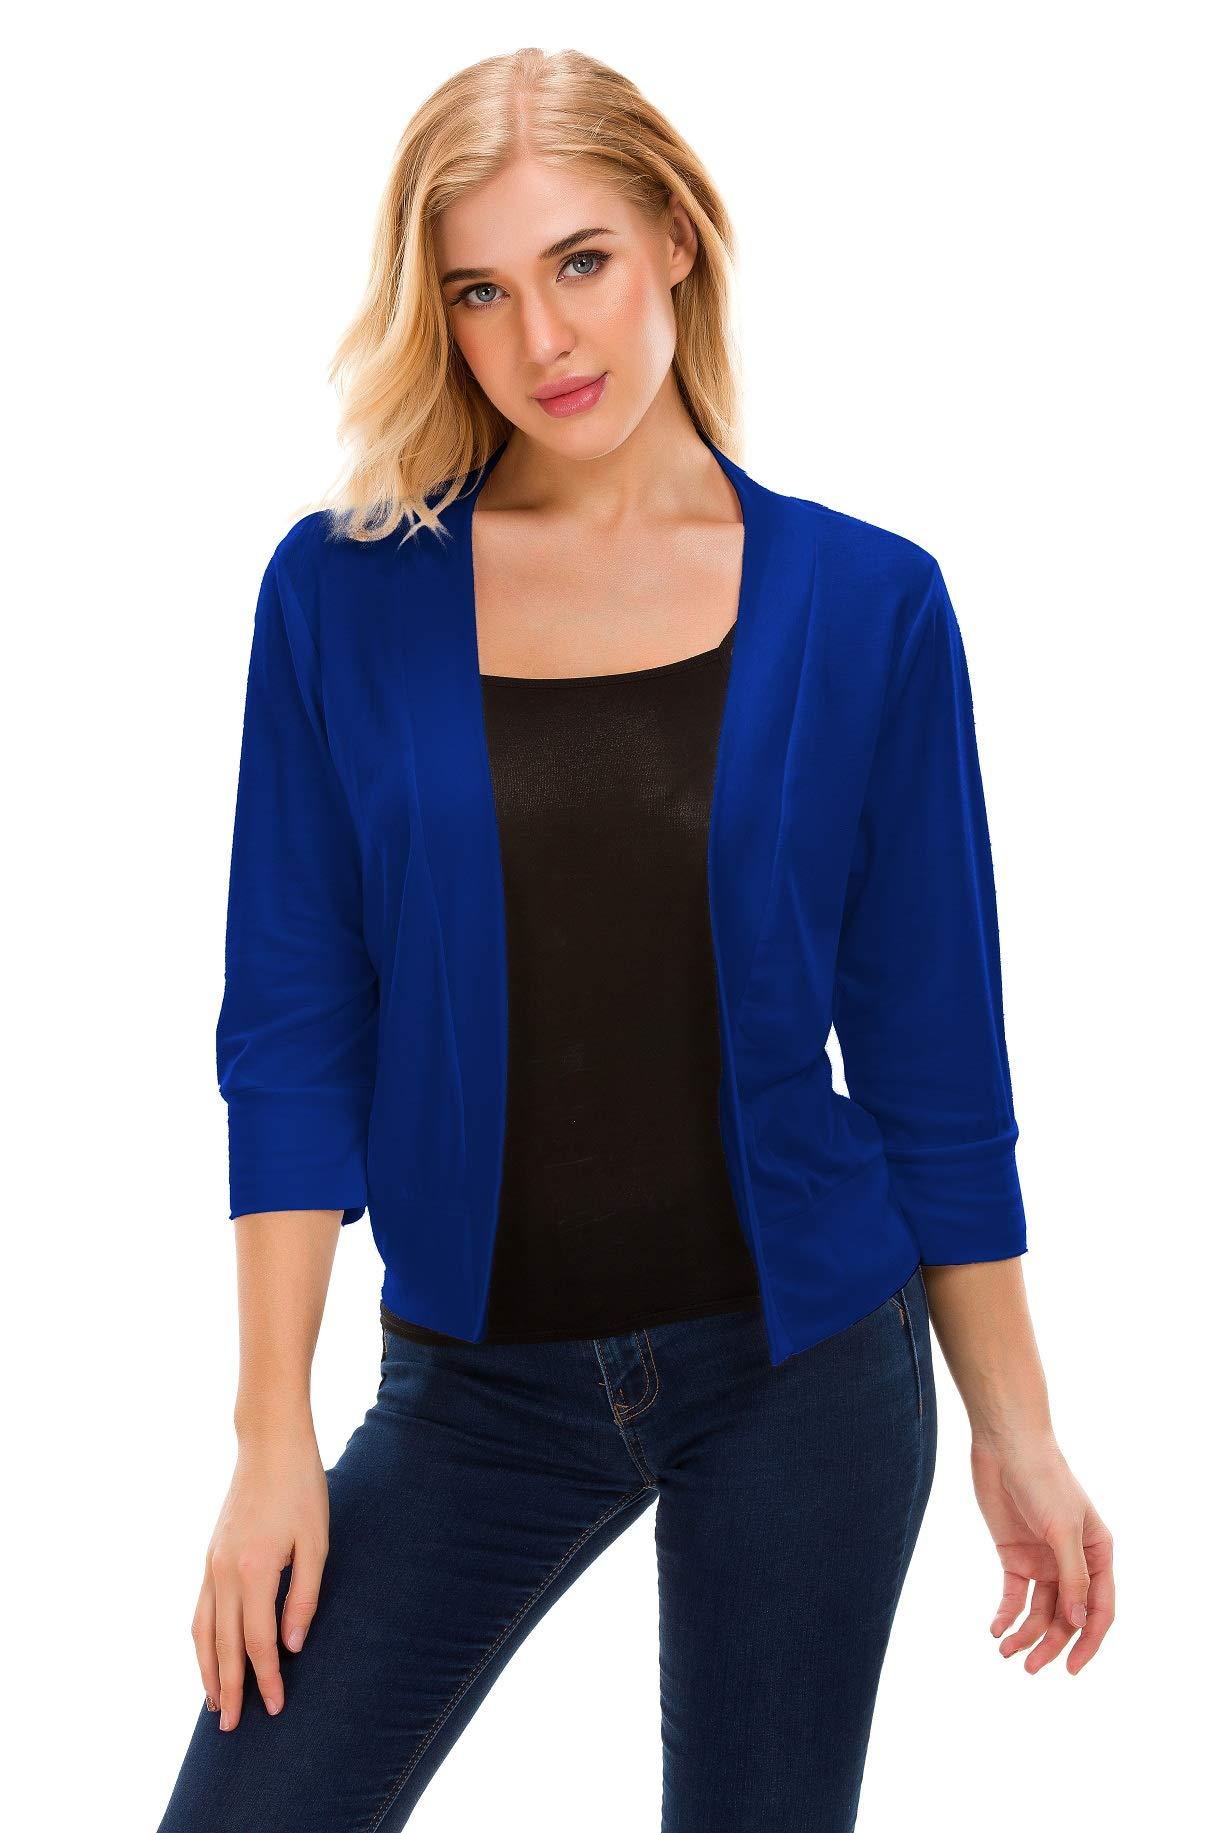 TownCat Womens Open Front Cardigans Classic 3/4 Sleeve Cropped Bolero Shrug Short Cardigans (Blue, S)